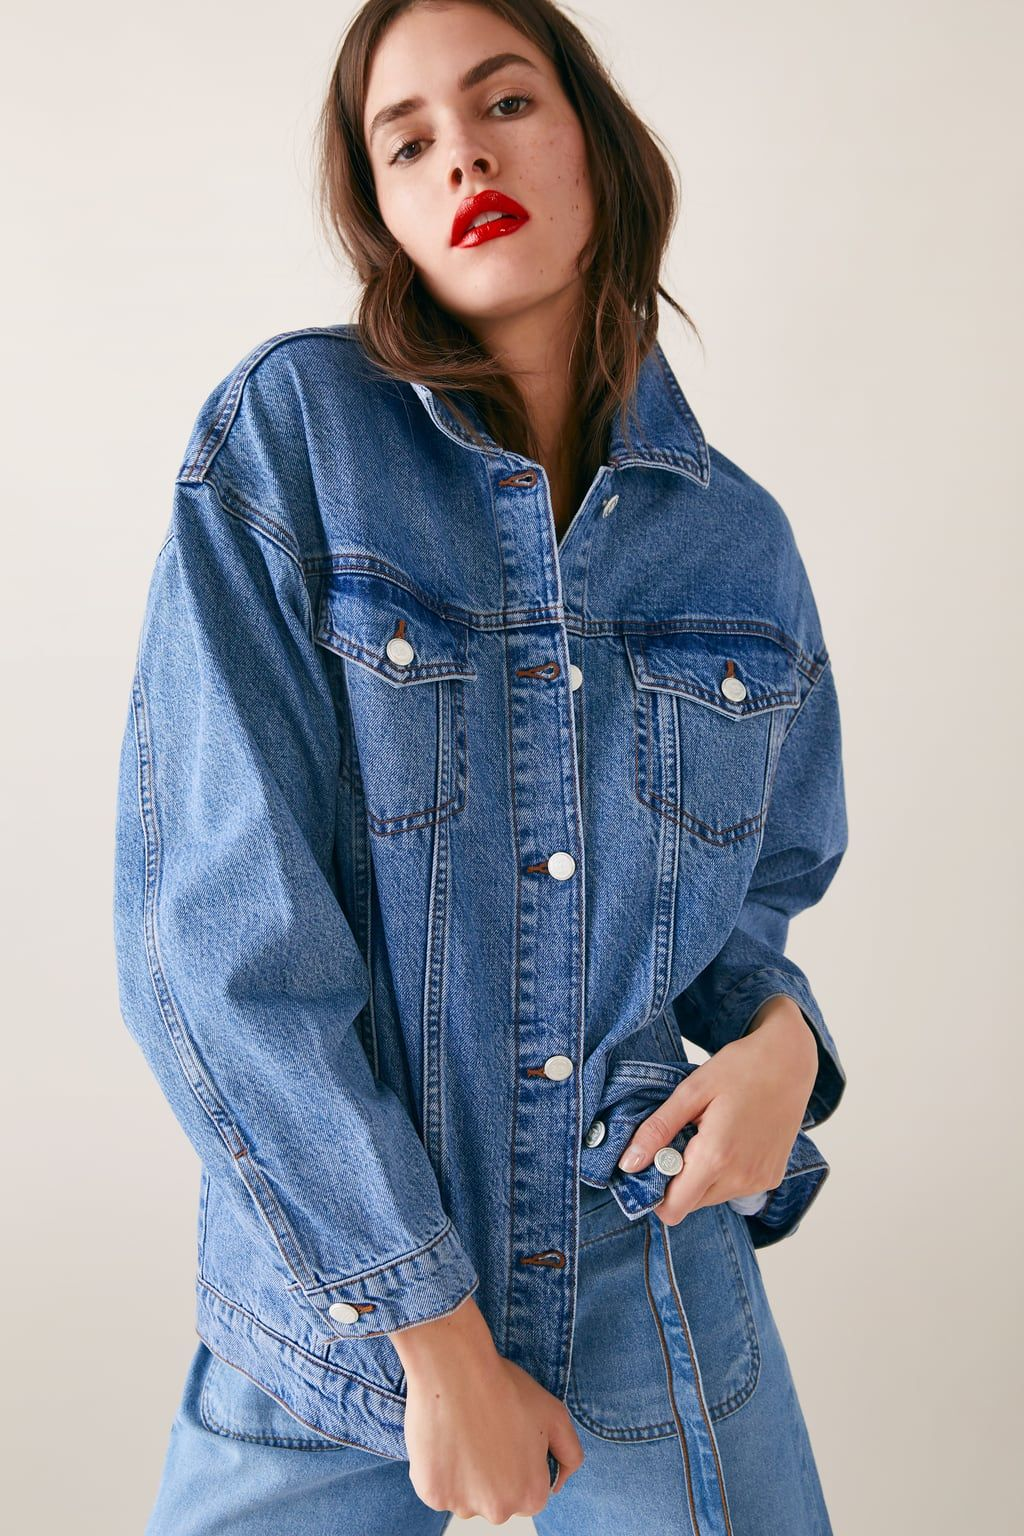 Oversized Denim Jacket Jackets Woman Zara United Kingdom Jean Jacket Outfits Denim Jacket Oversized Denim Jacket [ 1536 x 1024 Pixel ]